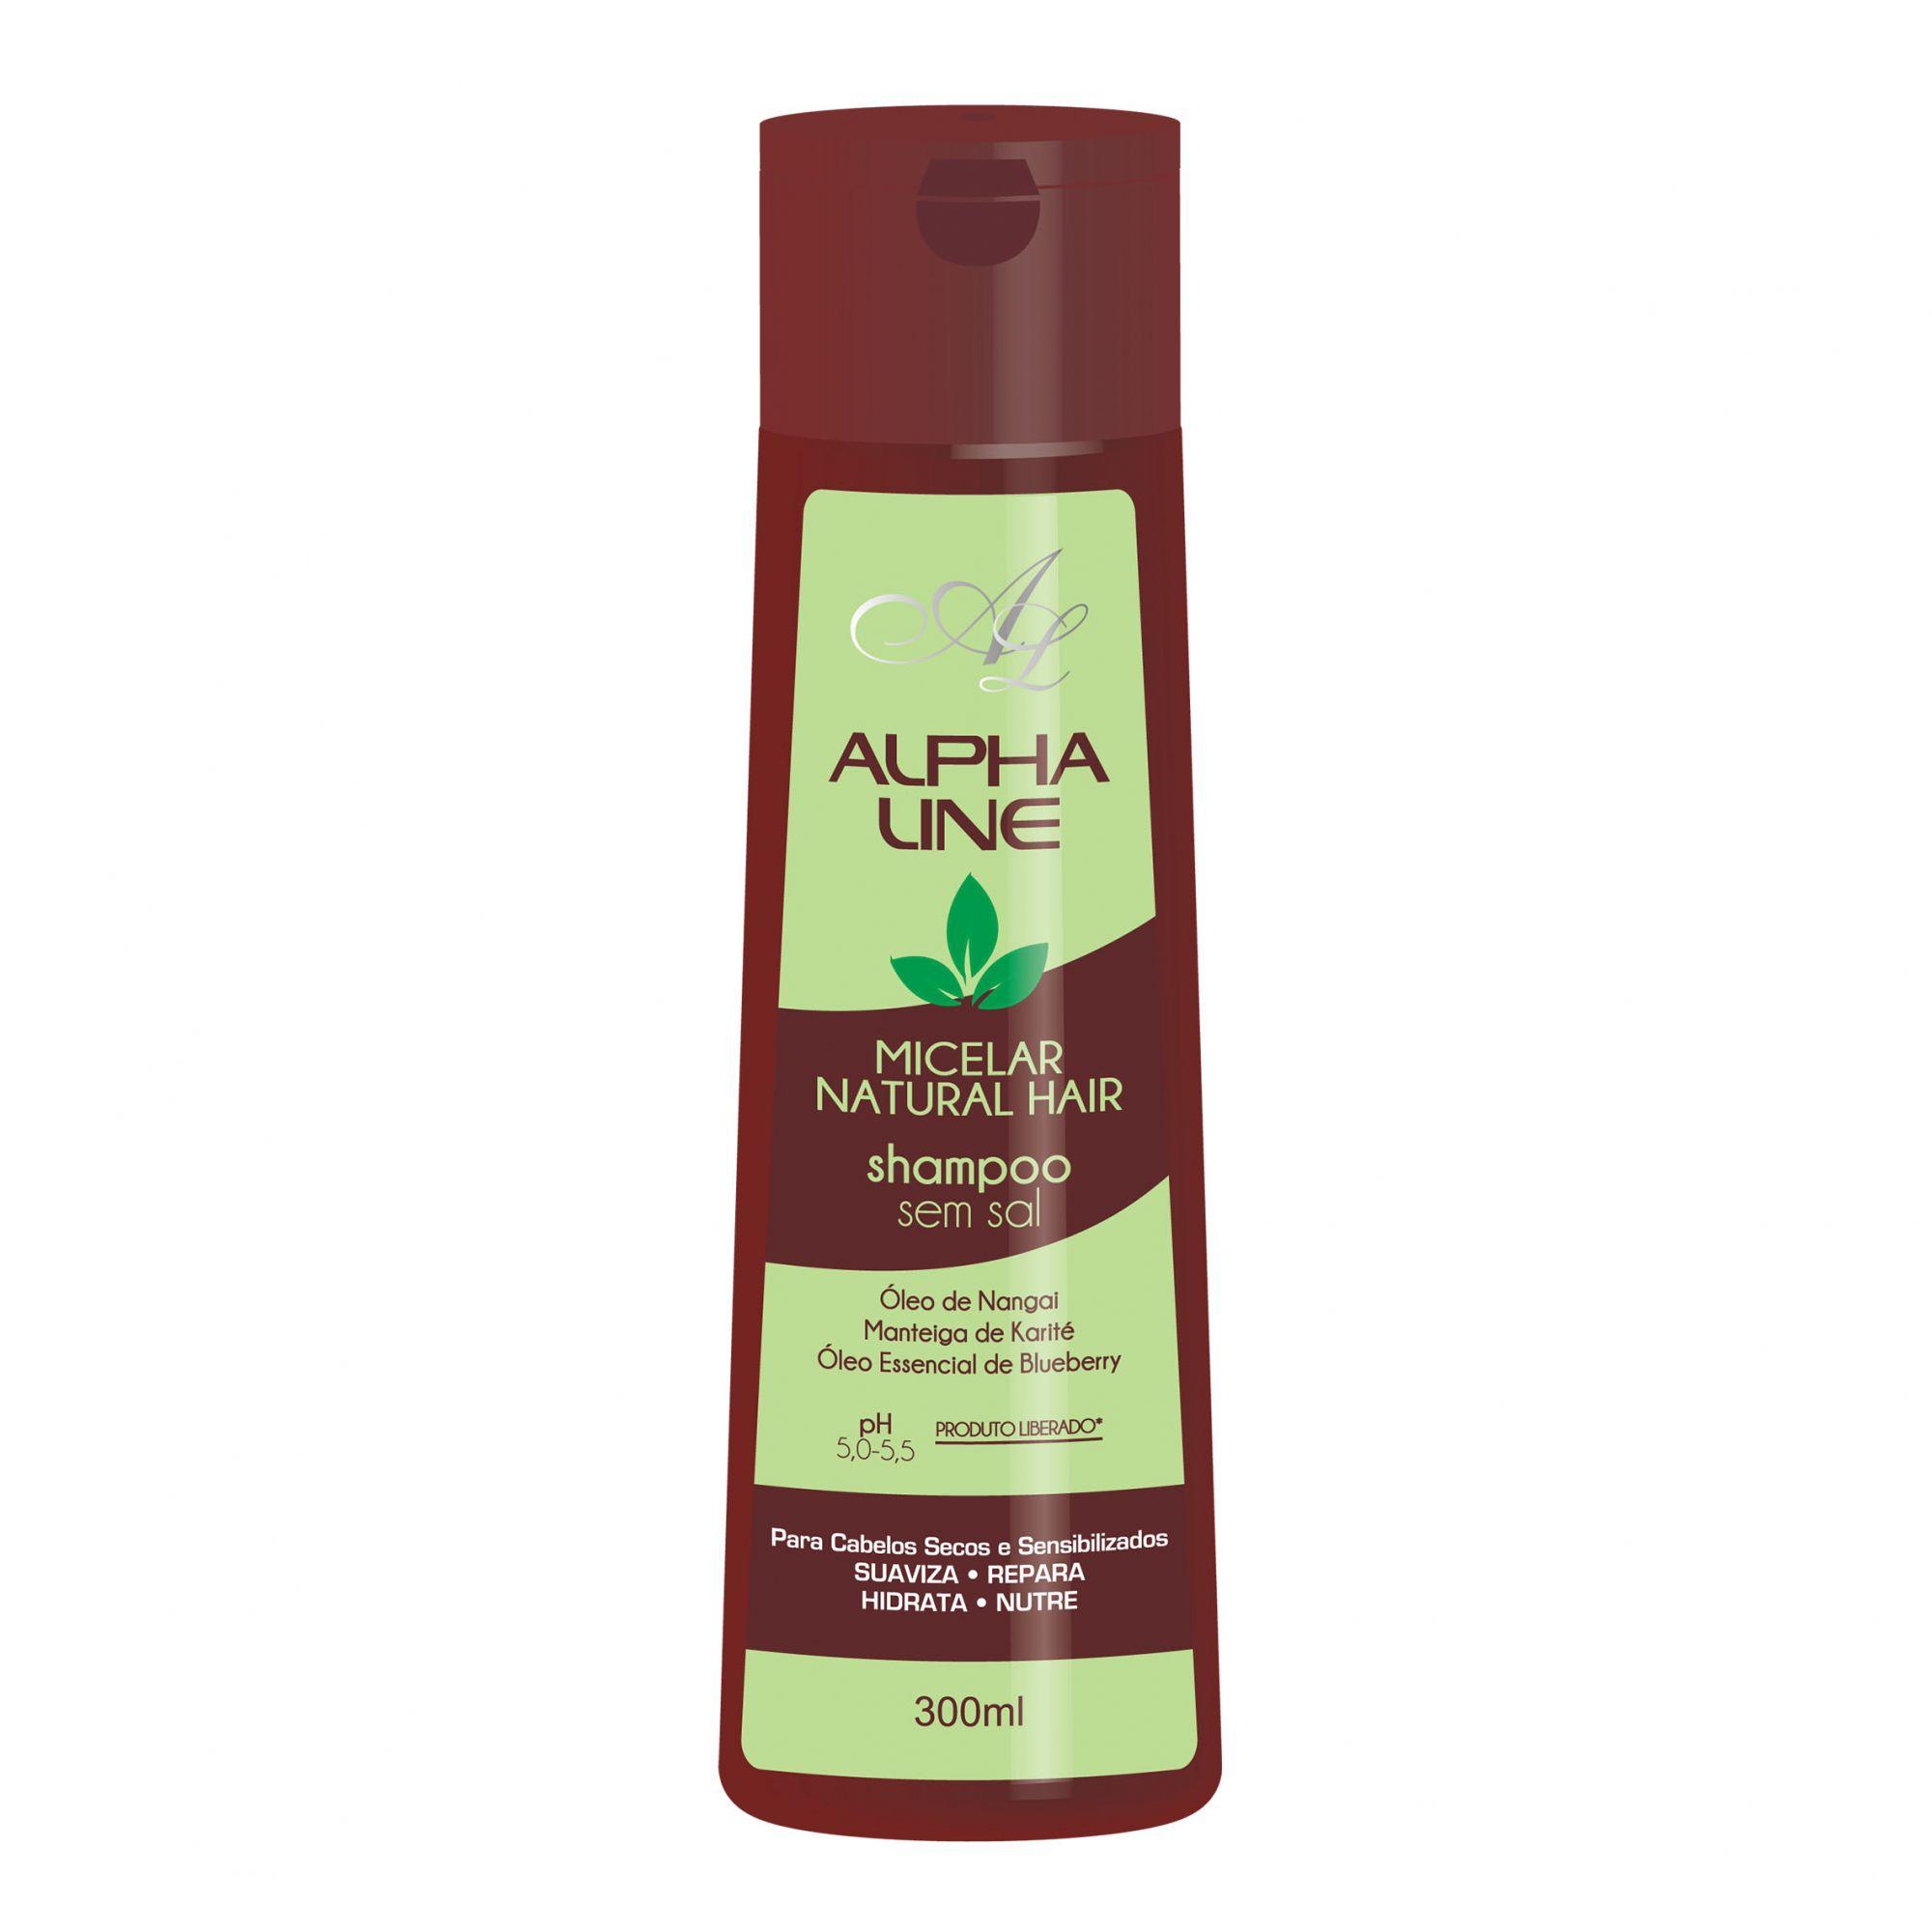 Alpha Line Micelar Natural Hair Shampoo 300g.